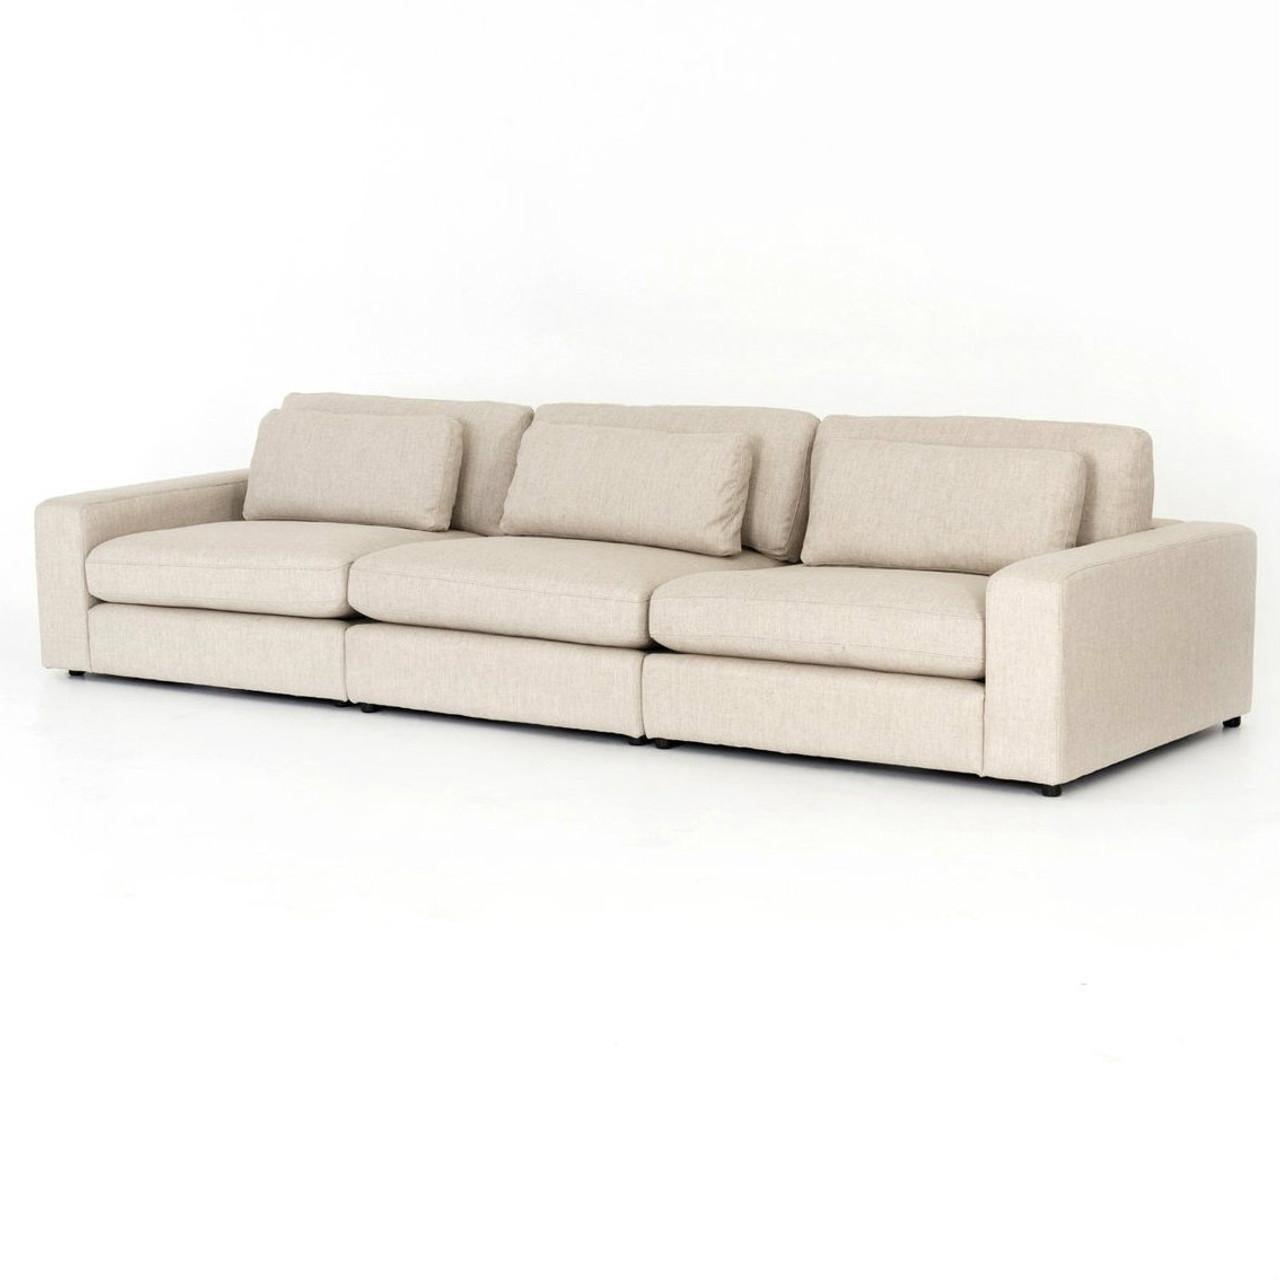 Bloor Beige Contemporary 3 Piece Modular Sofa 131\